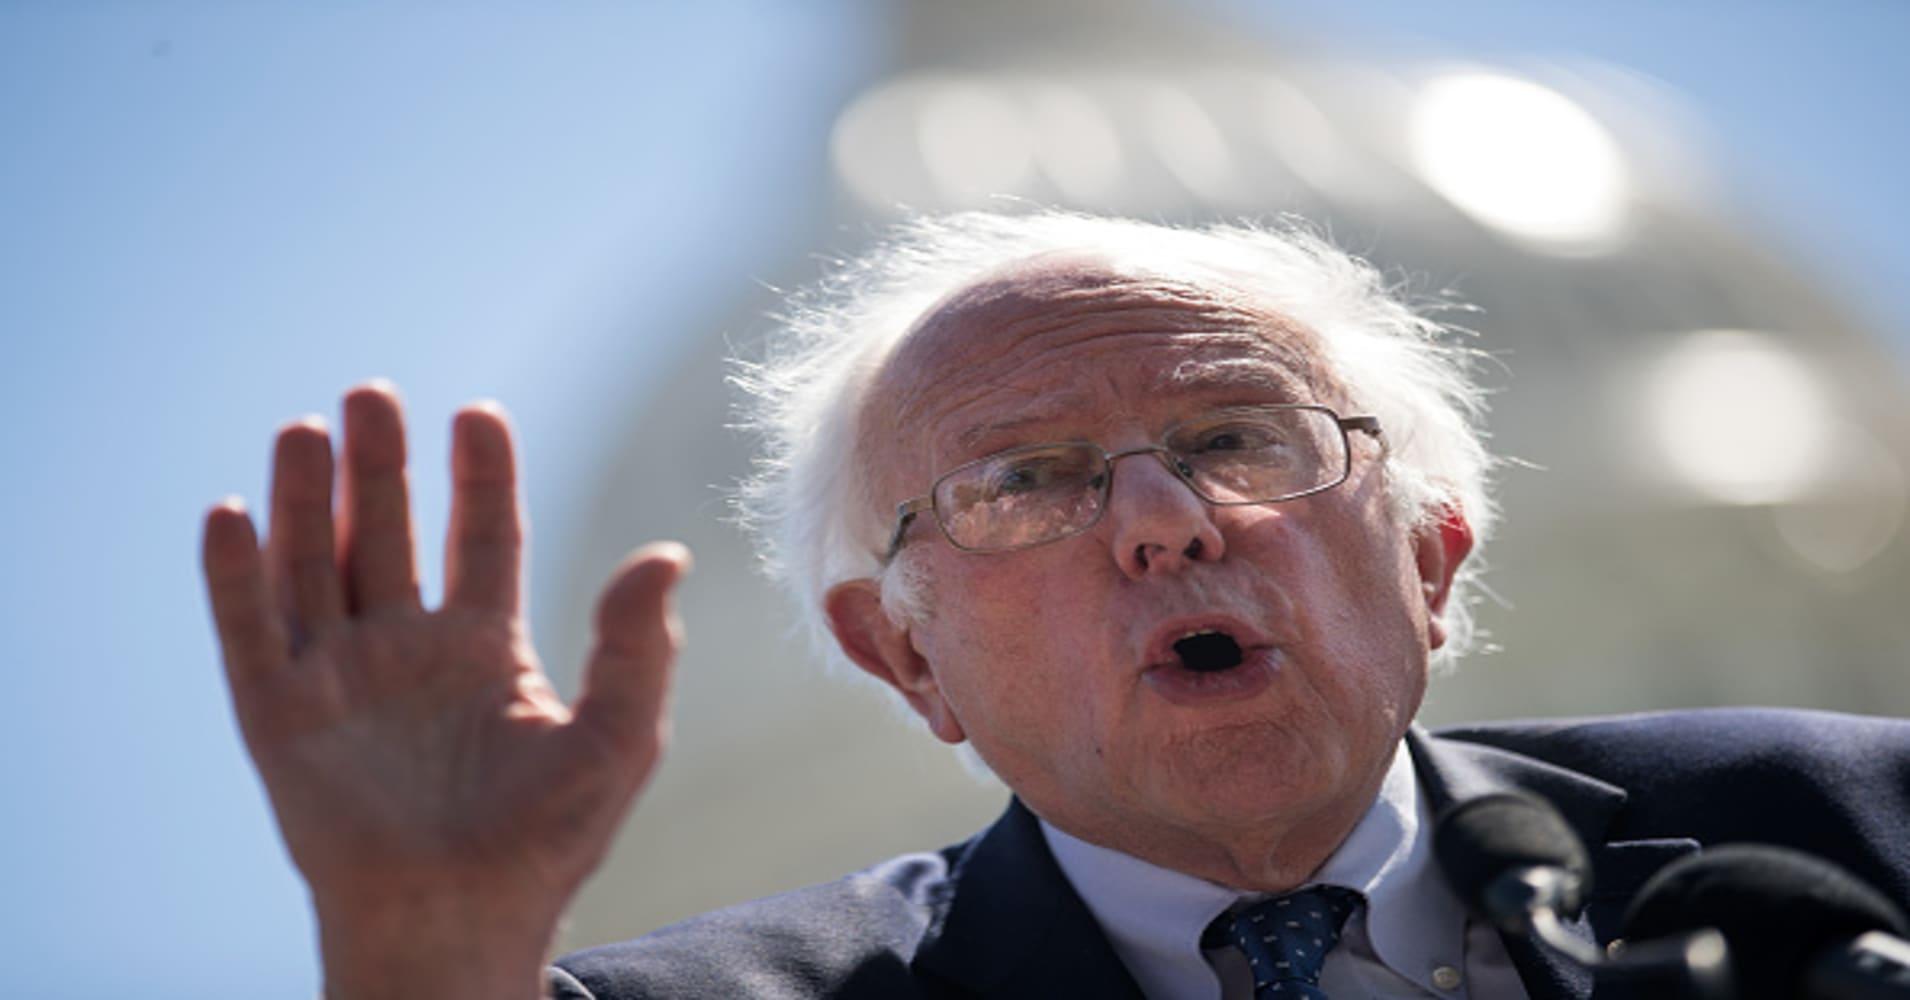 Bernie Sanders targets Walmart, calls for $15 minimum wage